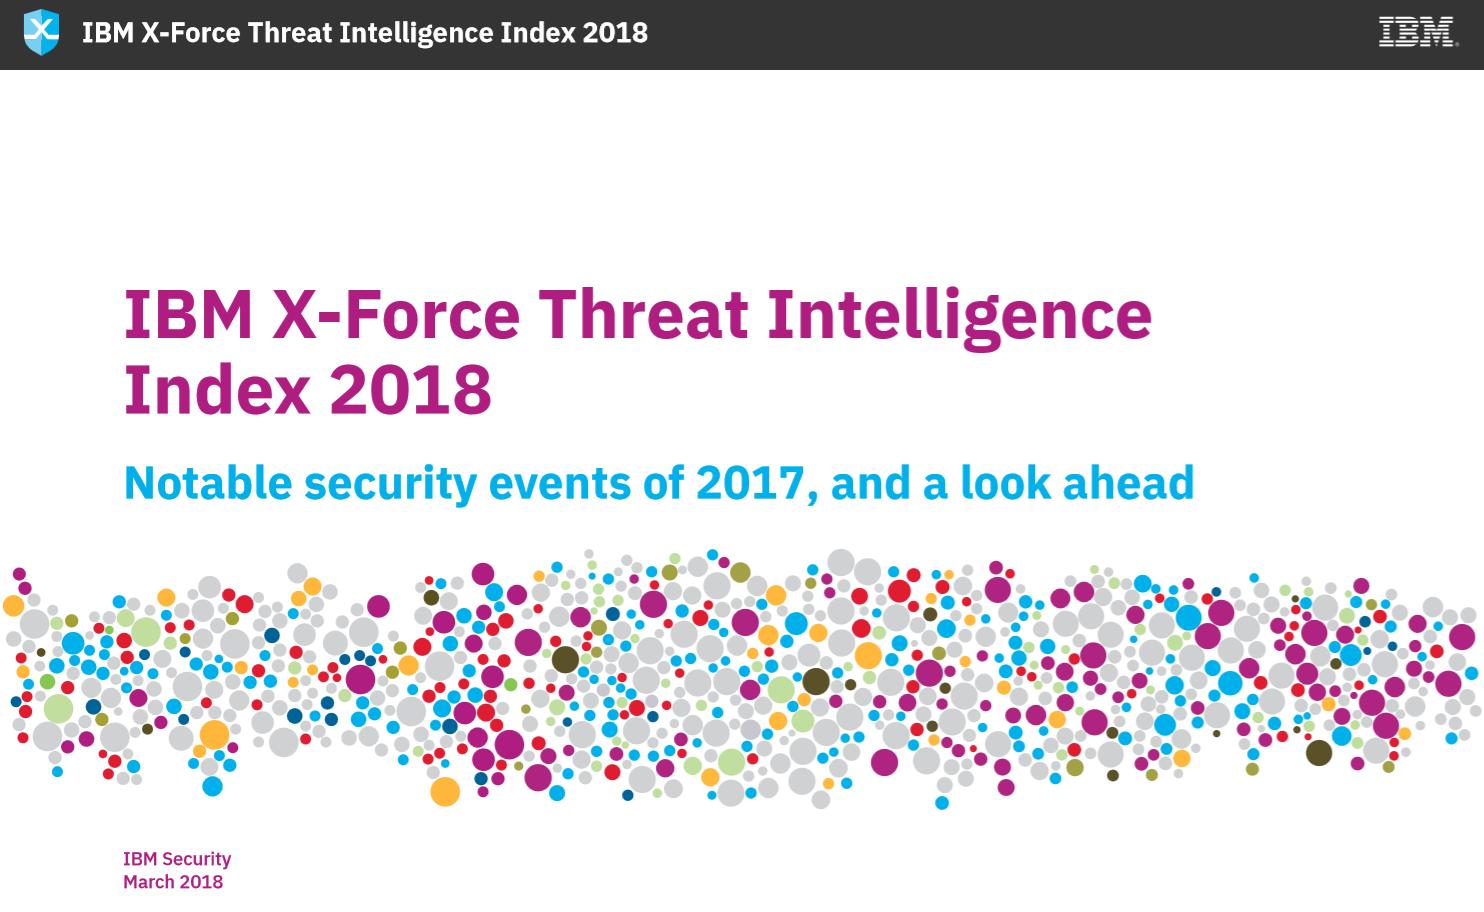 IBM X-Force Threat Intelligence Index 2018